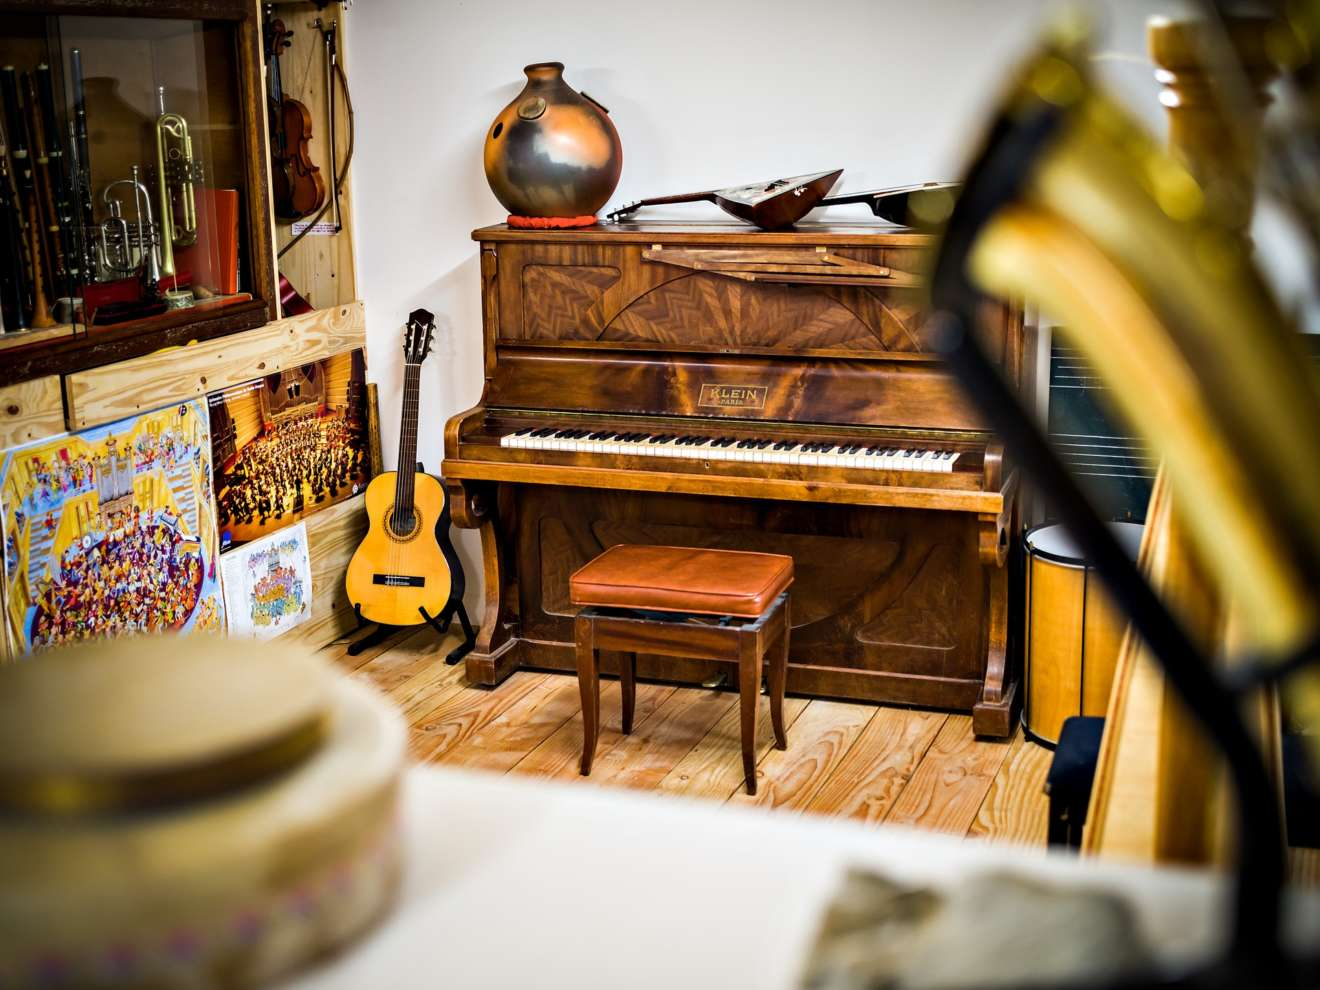 Atelier-du-Sardier-espace-musique-1-Arnaud-FRICH_1